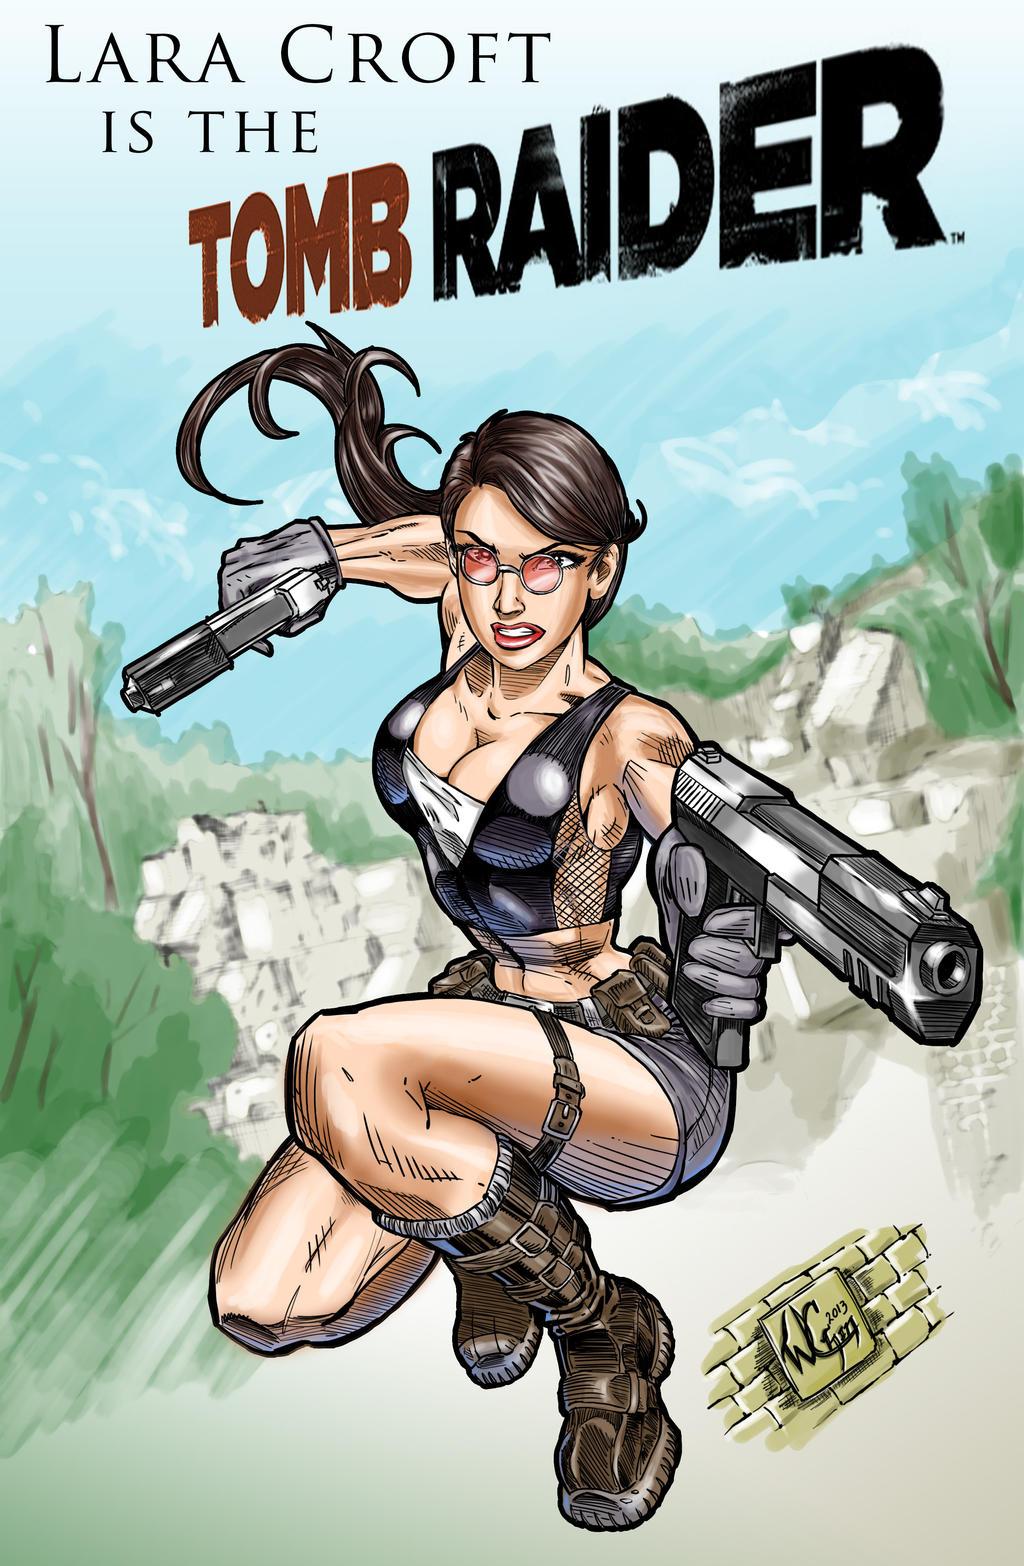 Lara Croft 2013 by wayner8088